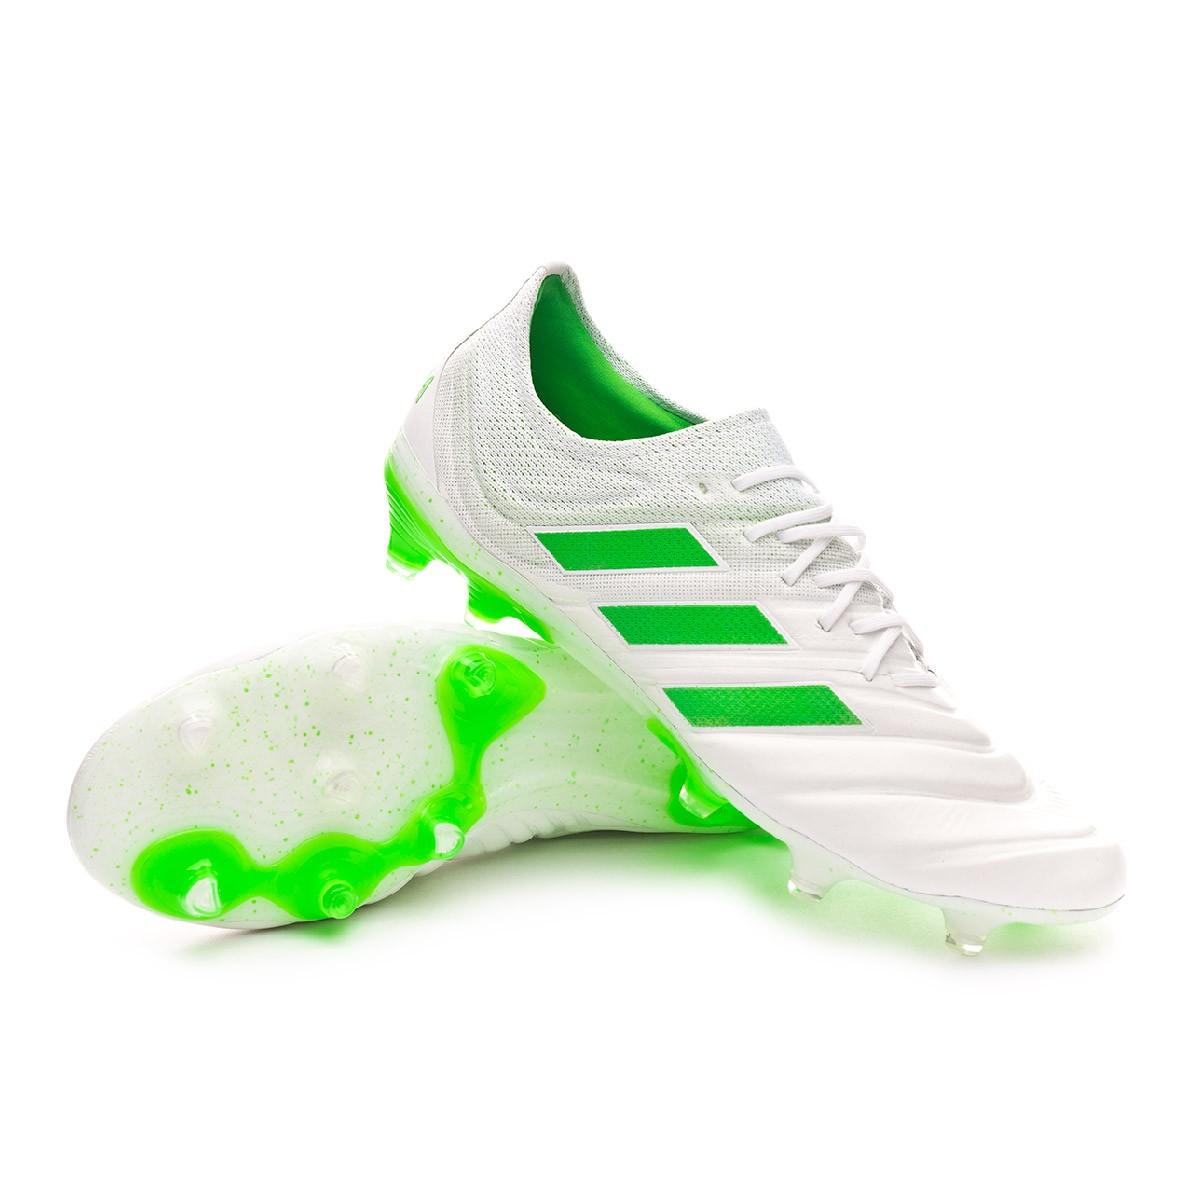 52204fe1f Football Boots adidas Copa 19.1 FG White-Solar lime - Football store Fútbol  Emotion